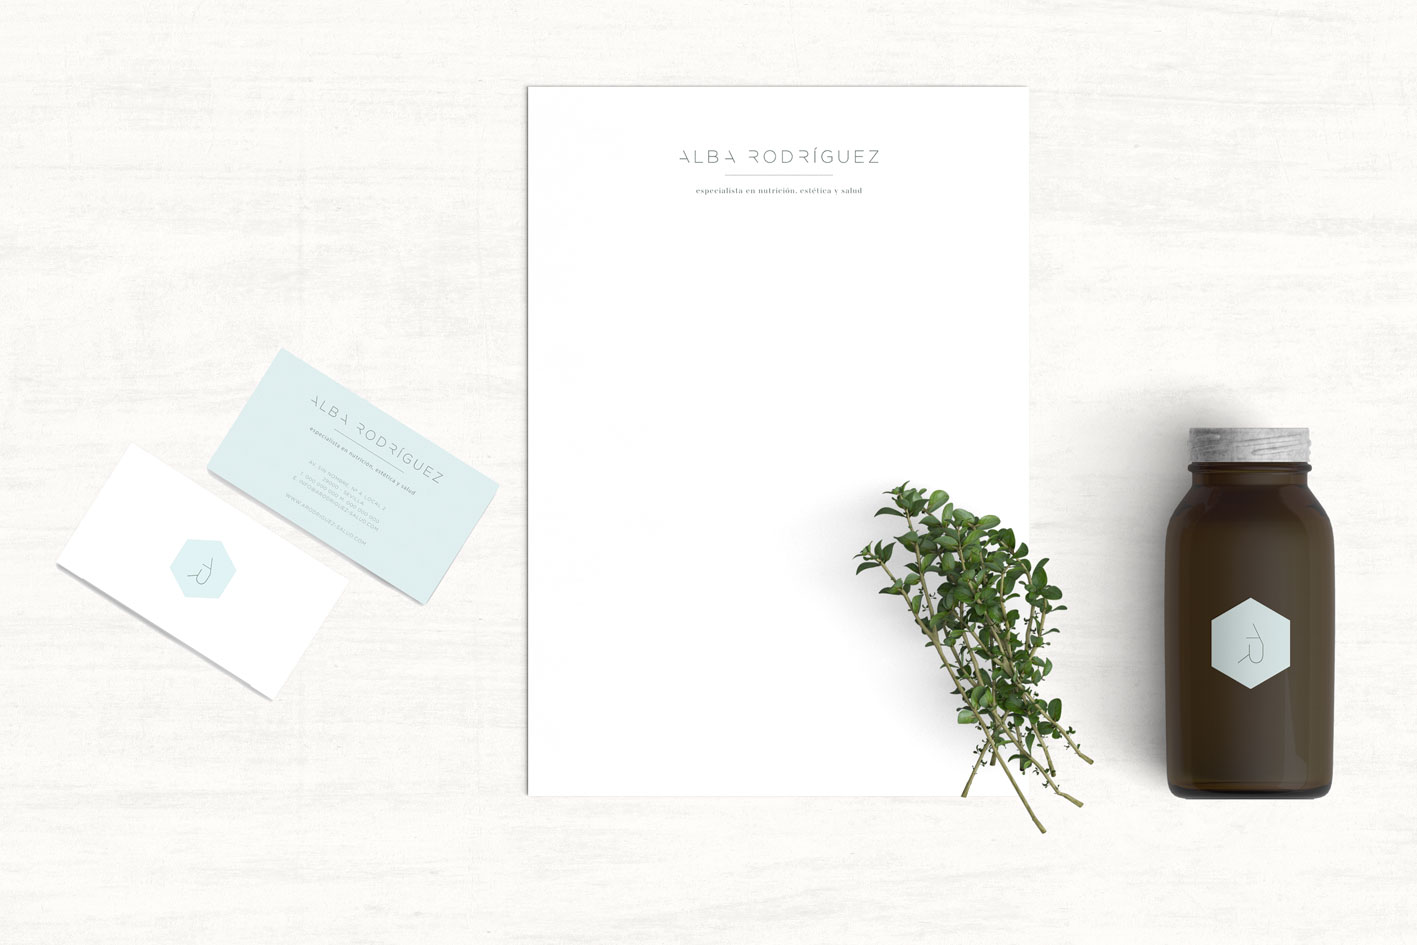 diseño logotipo tarjeta Alba Rodriguez por Blanco Ruso